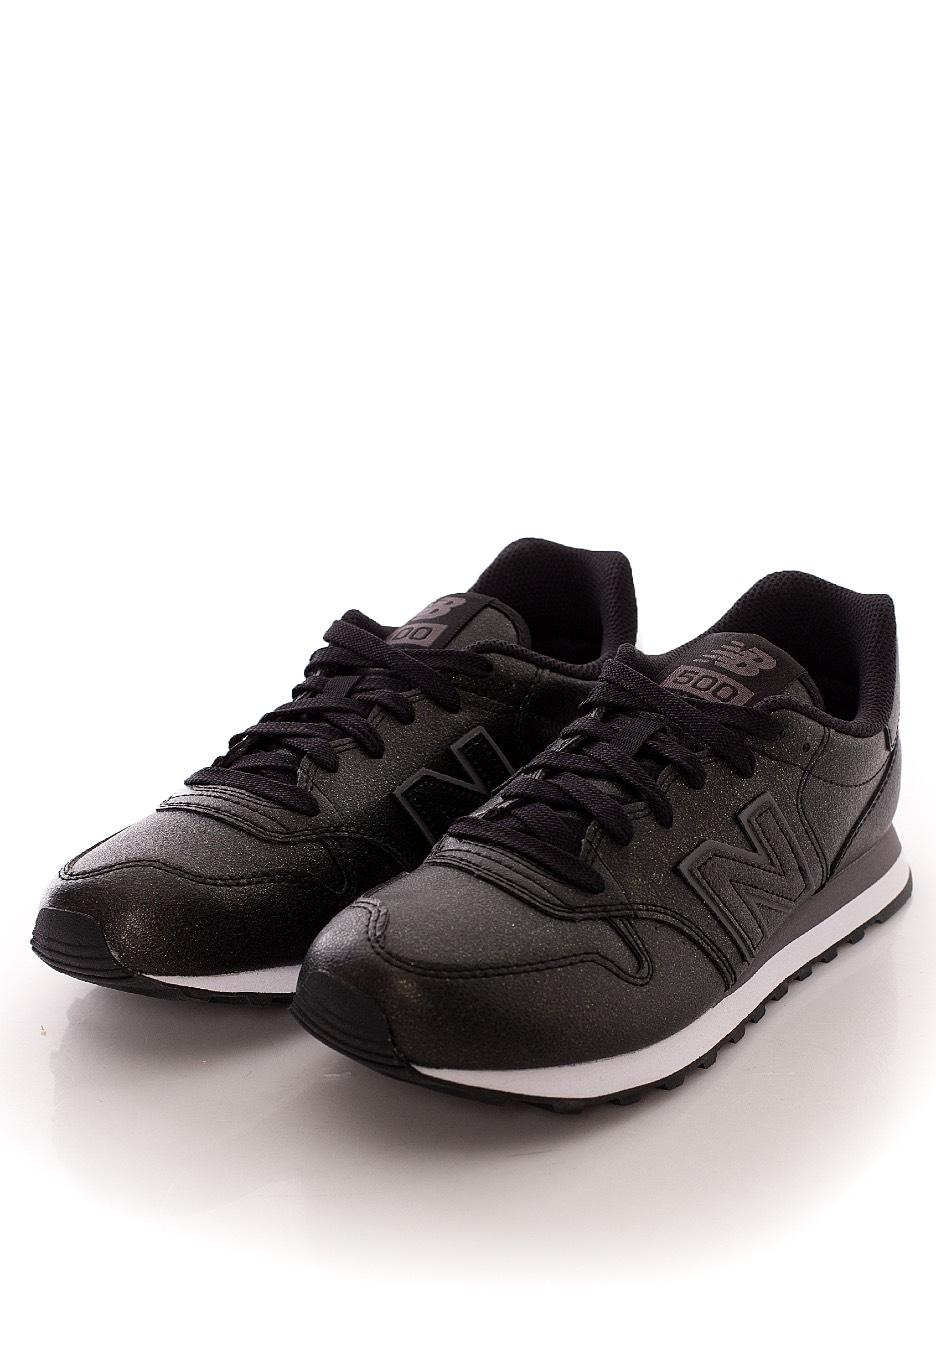 New Balance - GW500 MTK Black/Black - Girl Shoes - Impericon.com ...